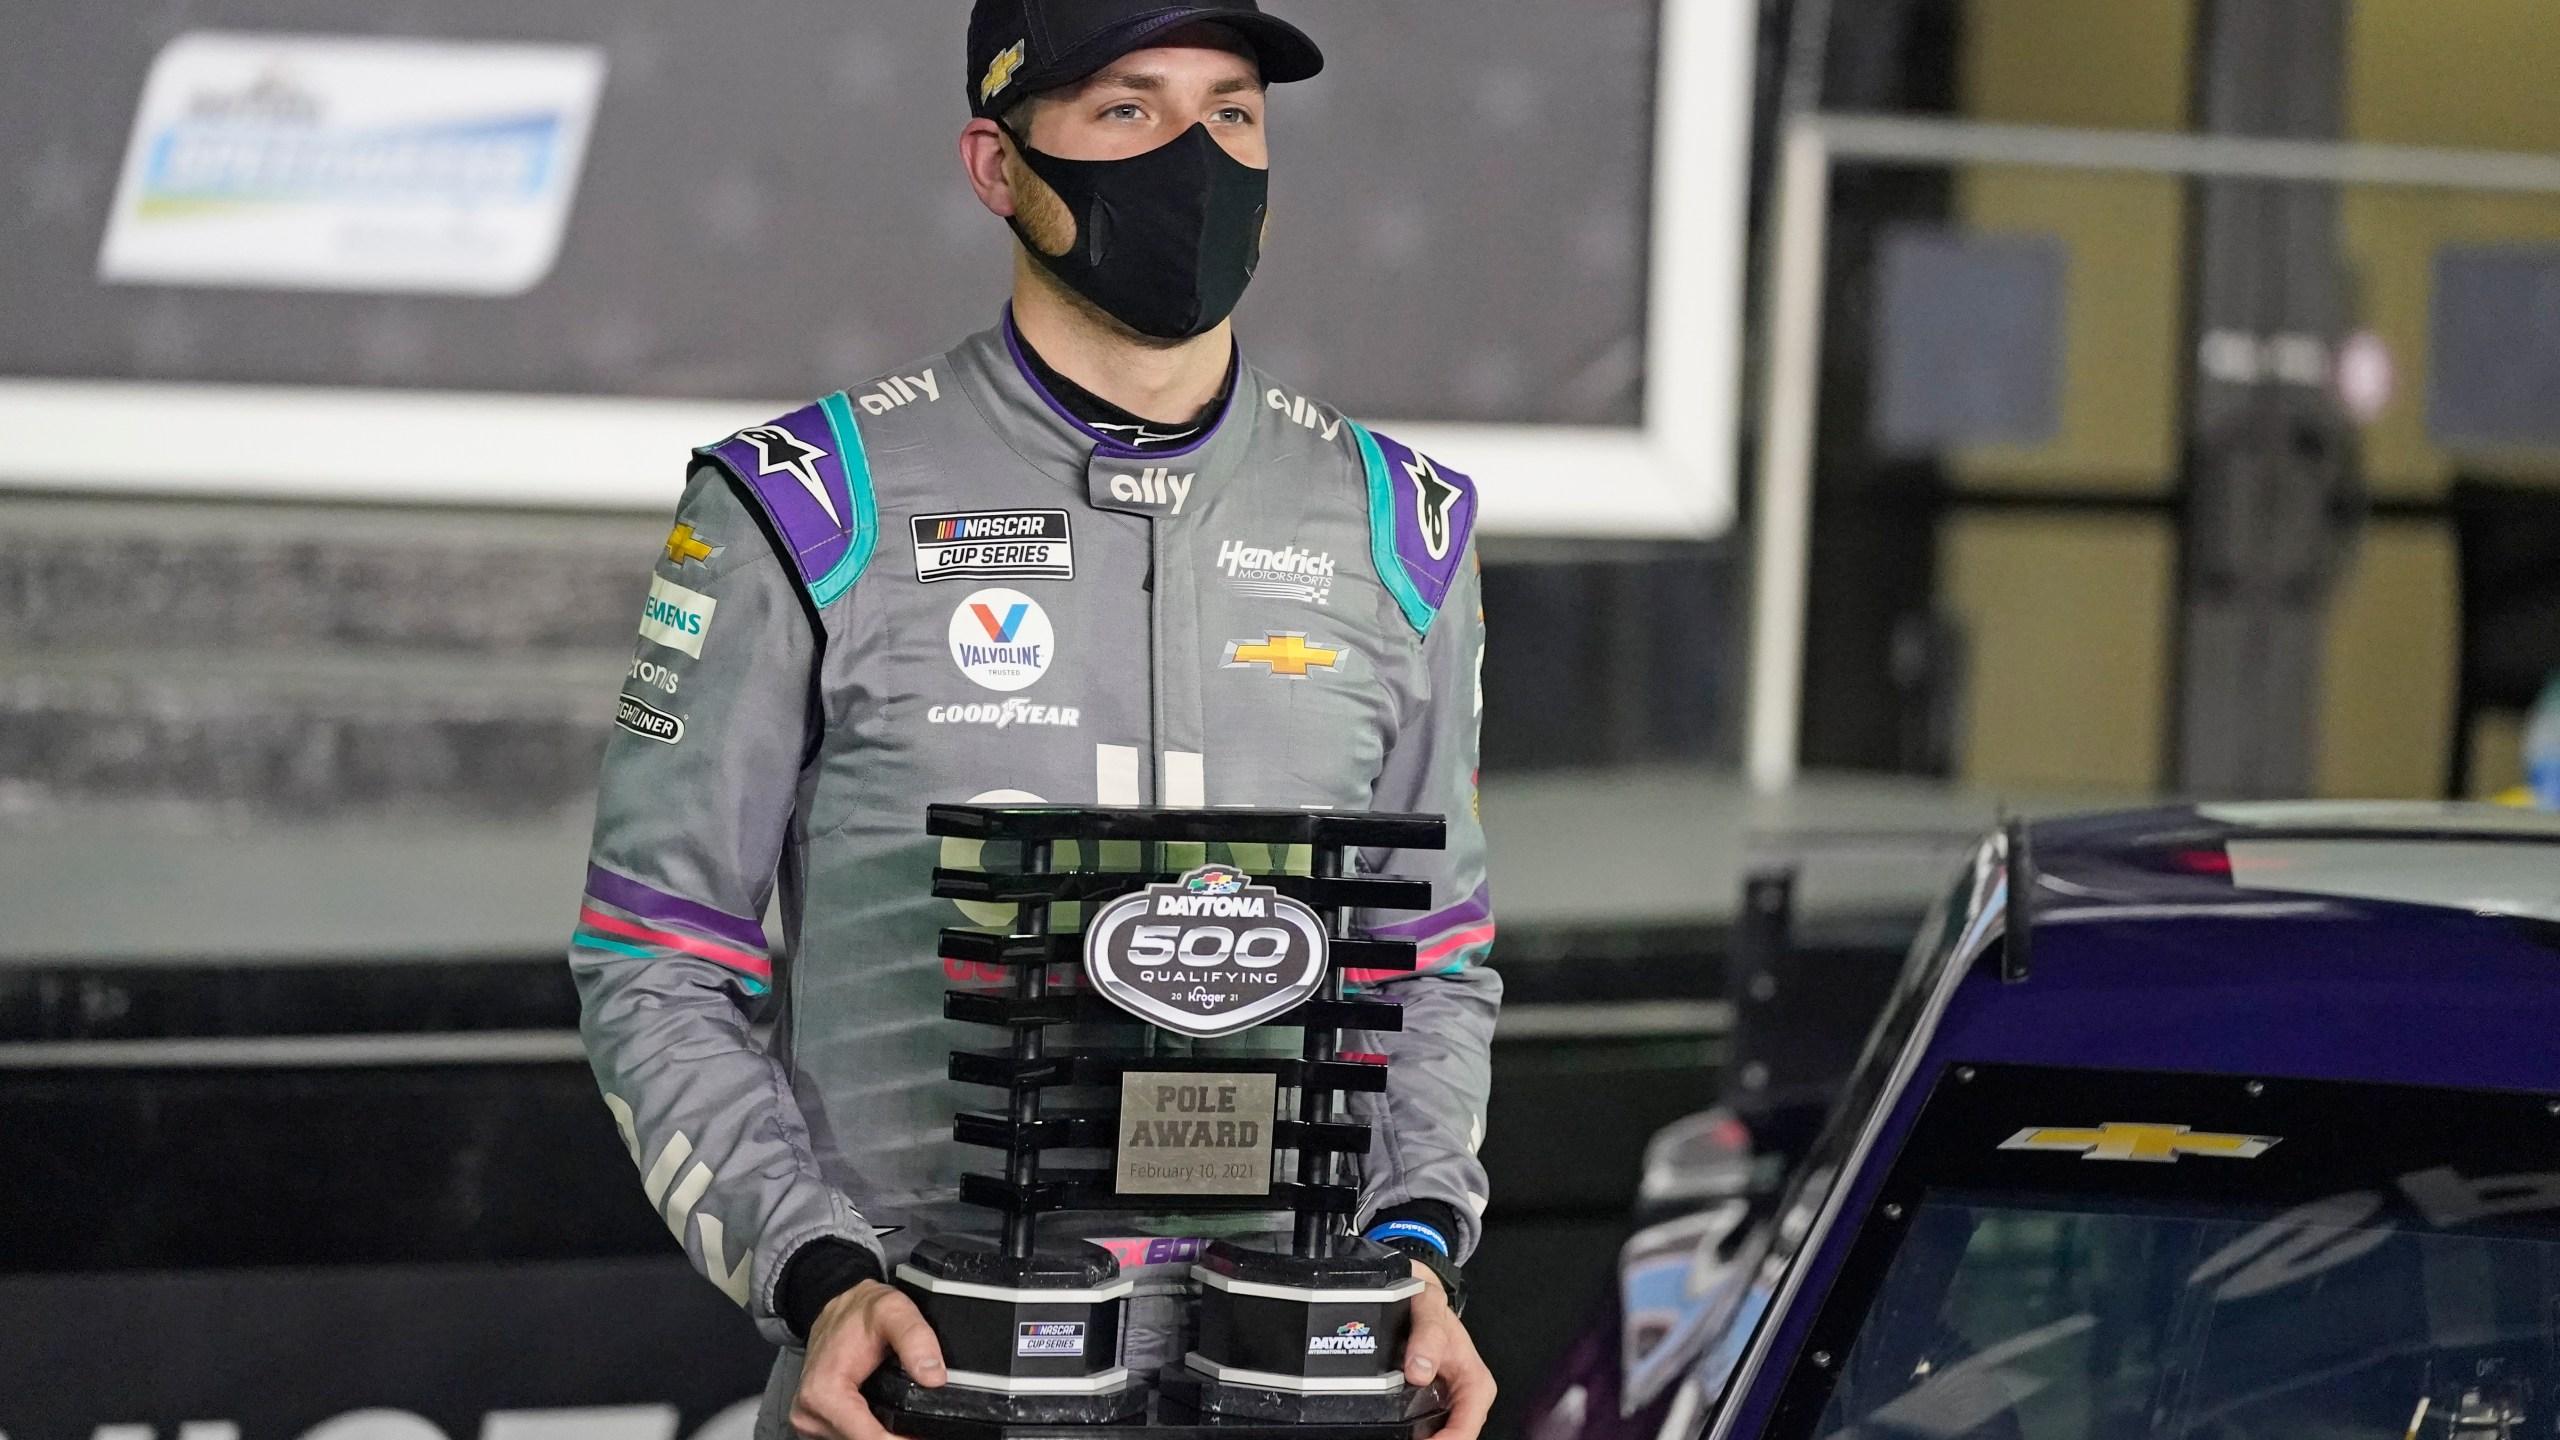 Alex Bowman holds the Pole Award Trophy in Victory Lane after winning the pole for the NASCAR Daytona 500 auto race at Daytona International Speedway, Wednesday, Feb. 10, 2021, in Daytona Beach, Fla. (AP Photo/John Raoux)